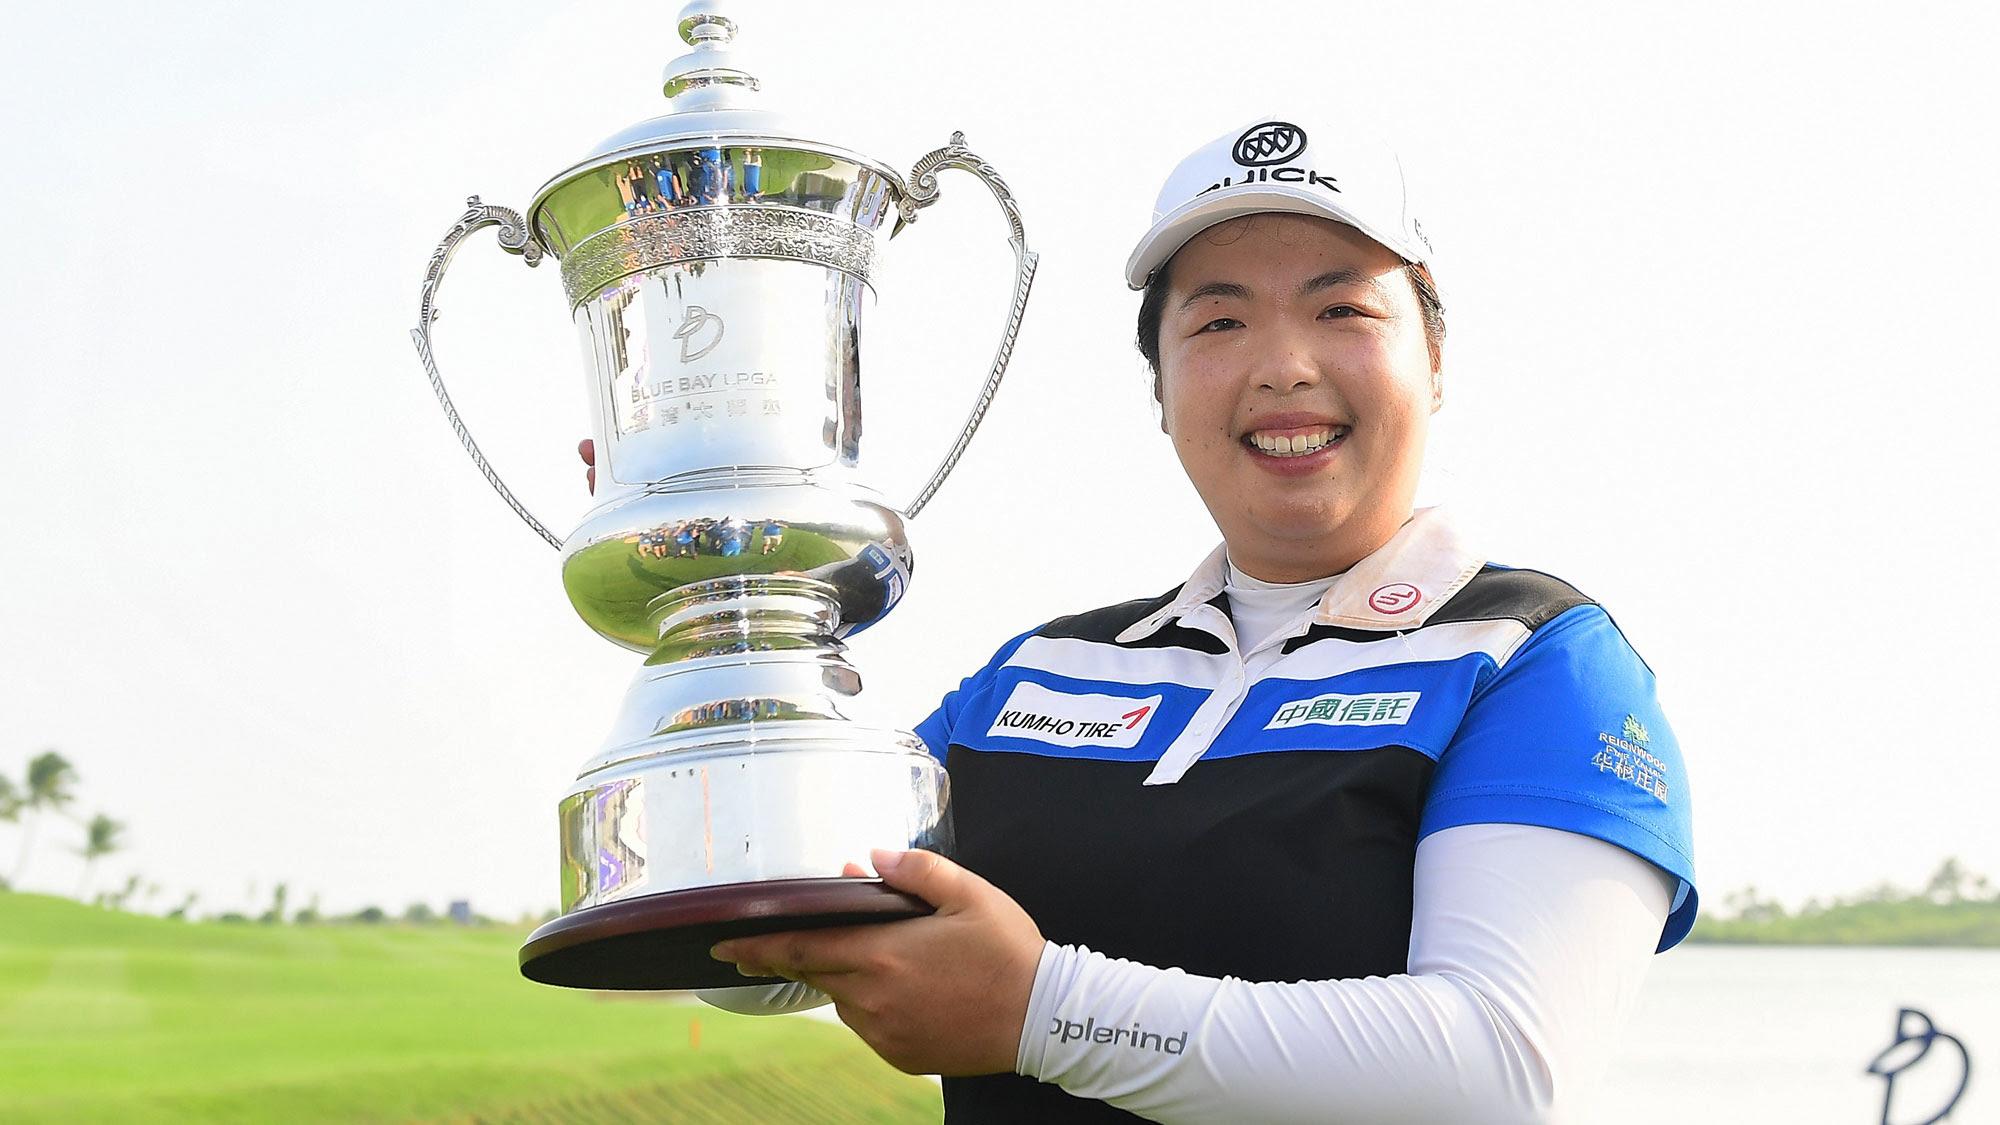 Defending champion Shanshan Feng